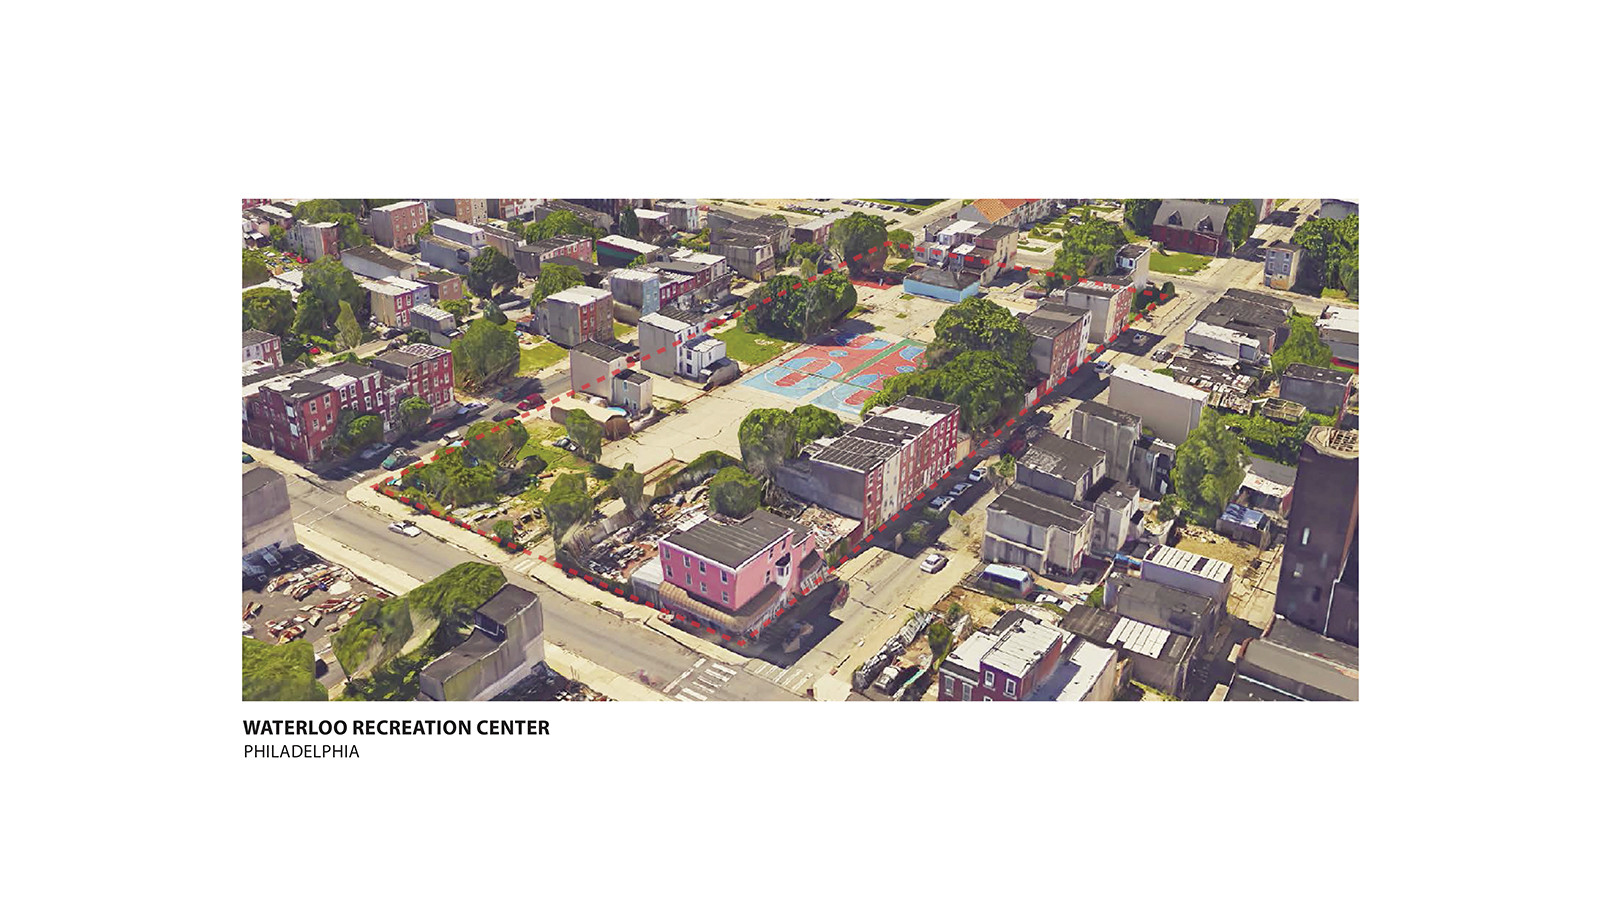 KAMJZ-Philadelphia-Waterloo-Recreation-Center-1-1600×900-2